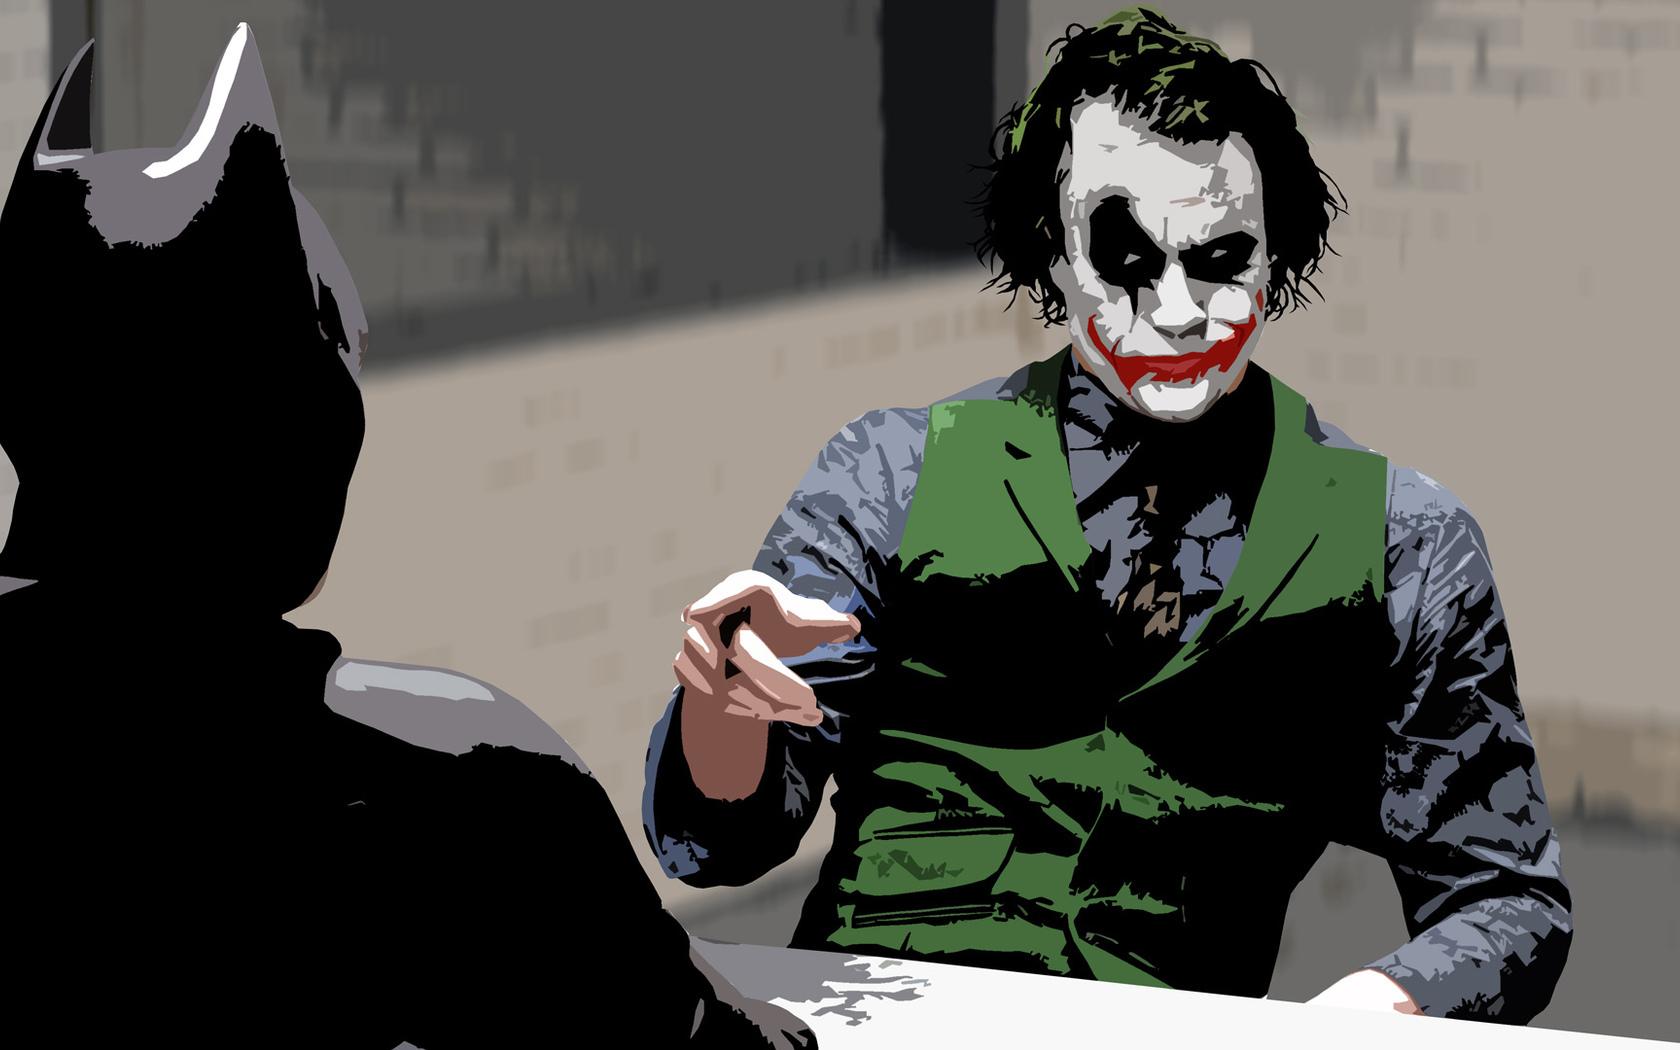 17351 download wallpaper Cinema, Batman, Joker screensavers and pictures for free